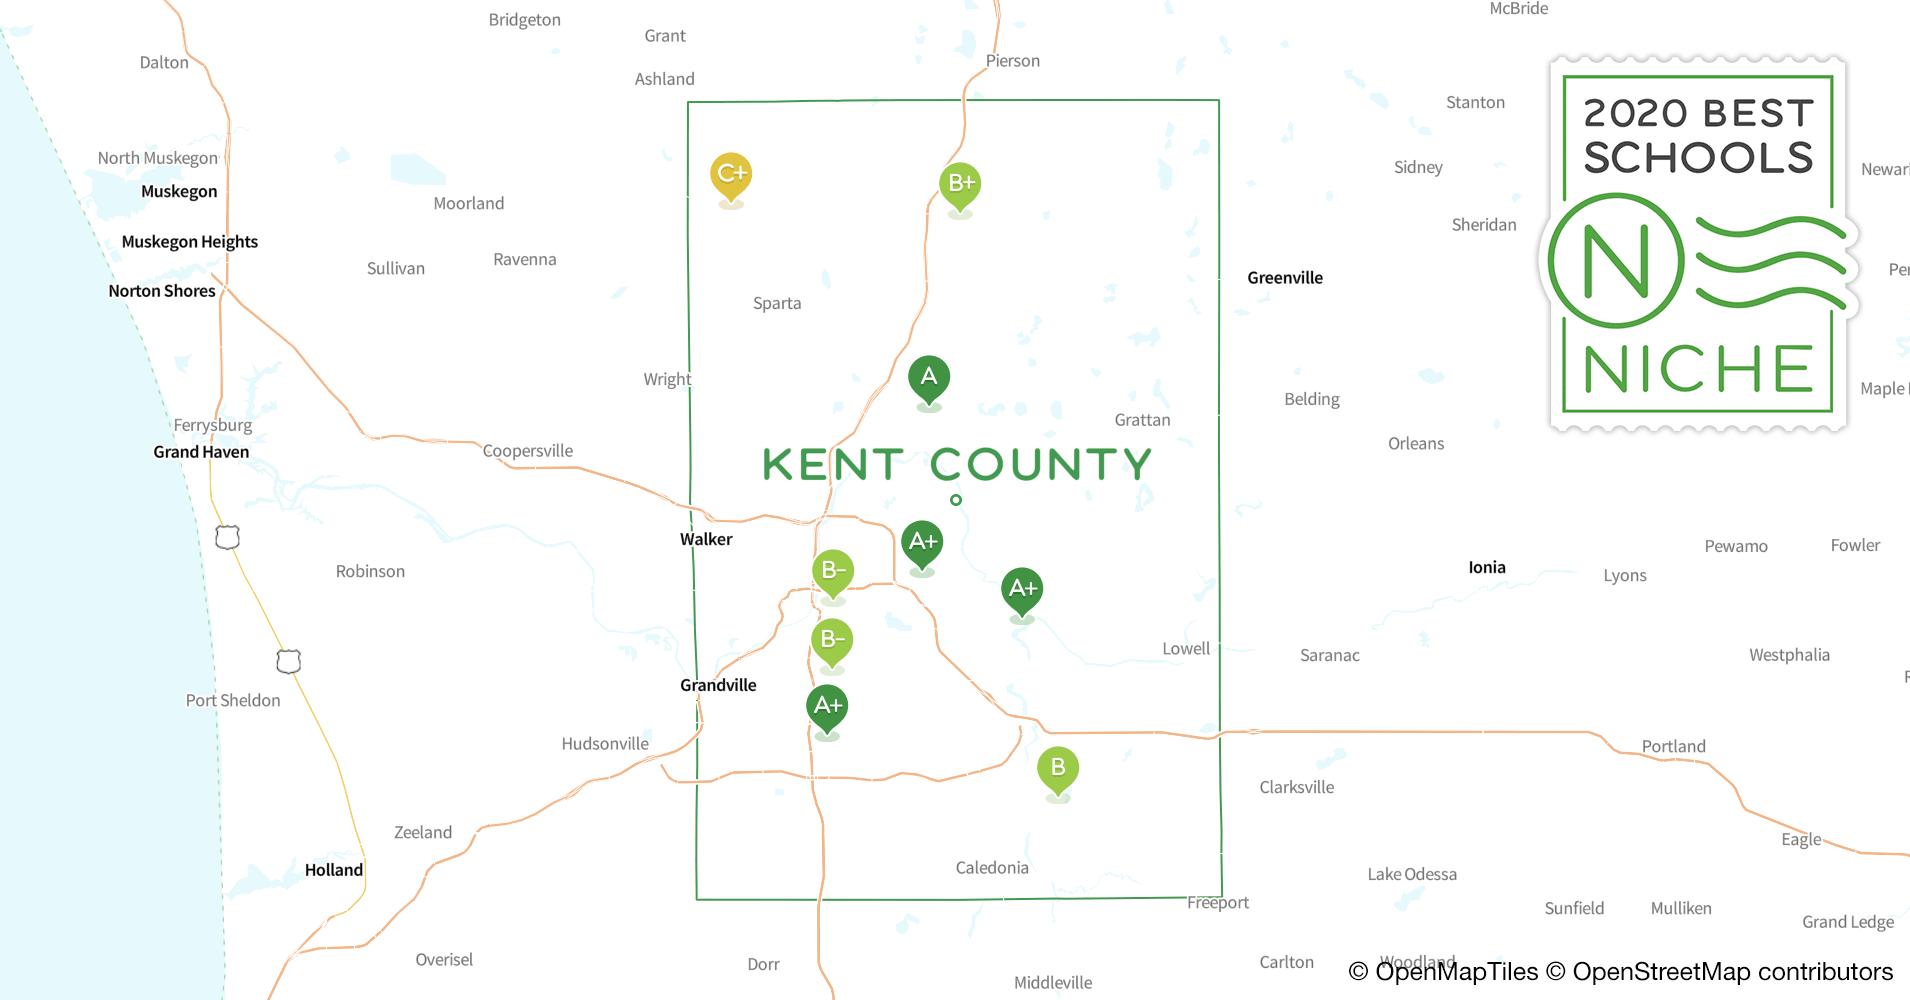 Charter s in Kent County, MI - Niche on katy isd map, edgewood isd map, princeton isd map, frisco isd map, waco isd map, dickinson isd map, farmersville isd map, midlothian isd map,